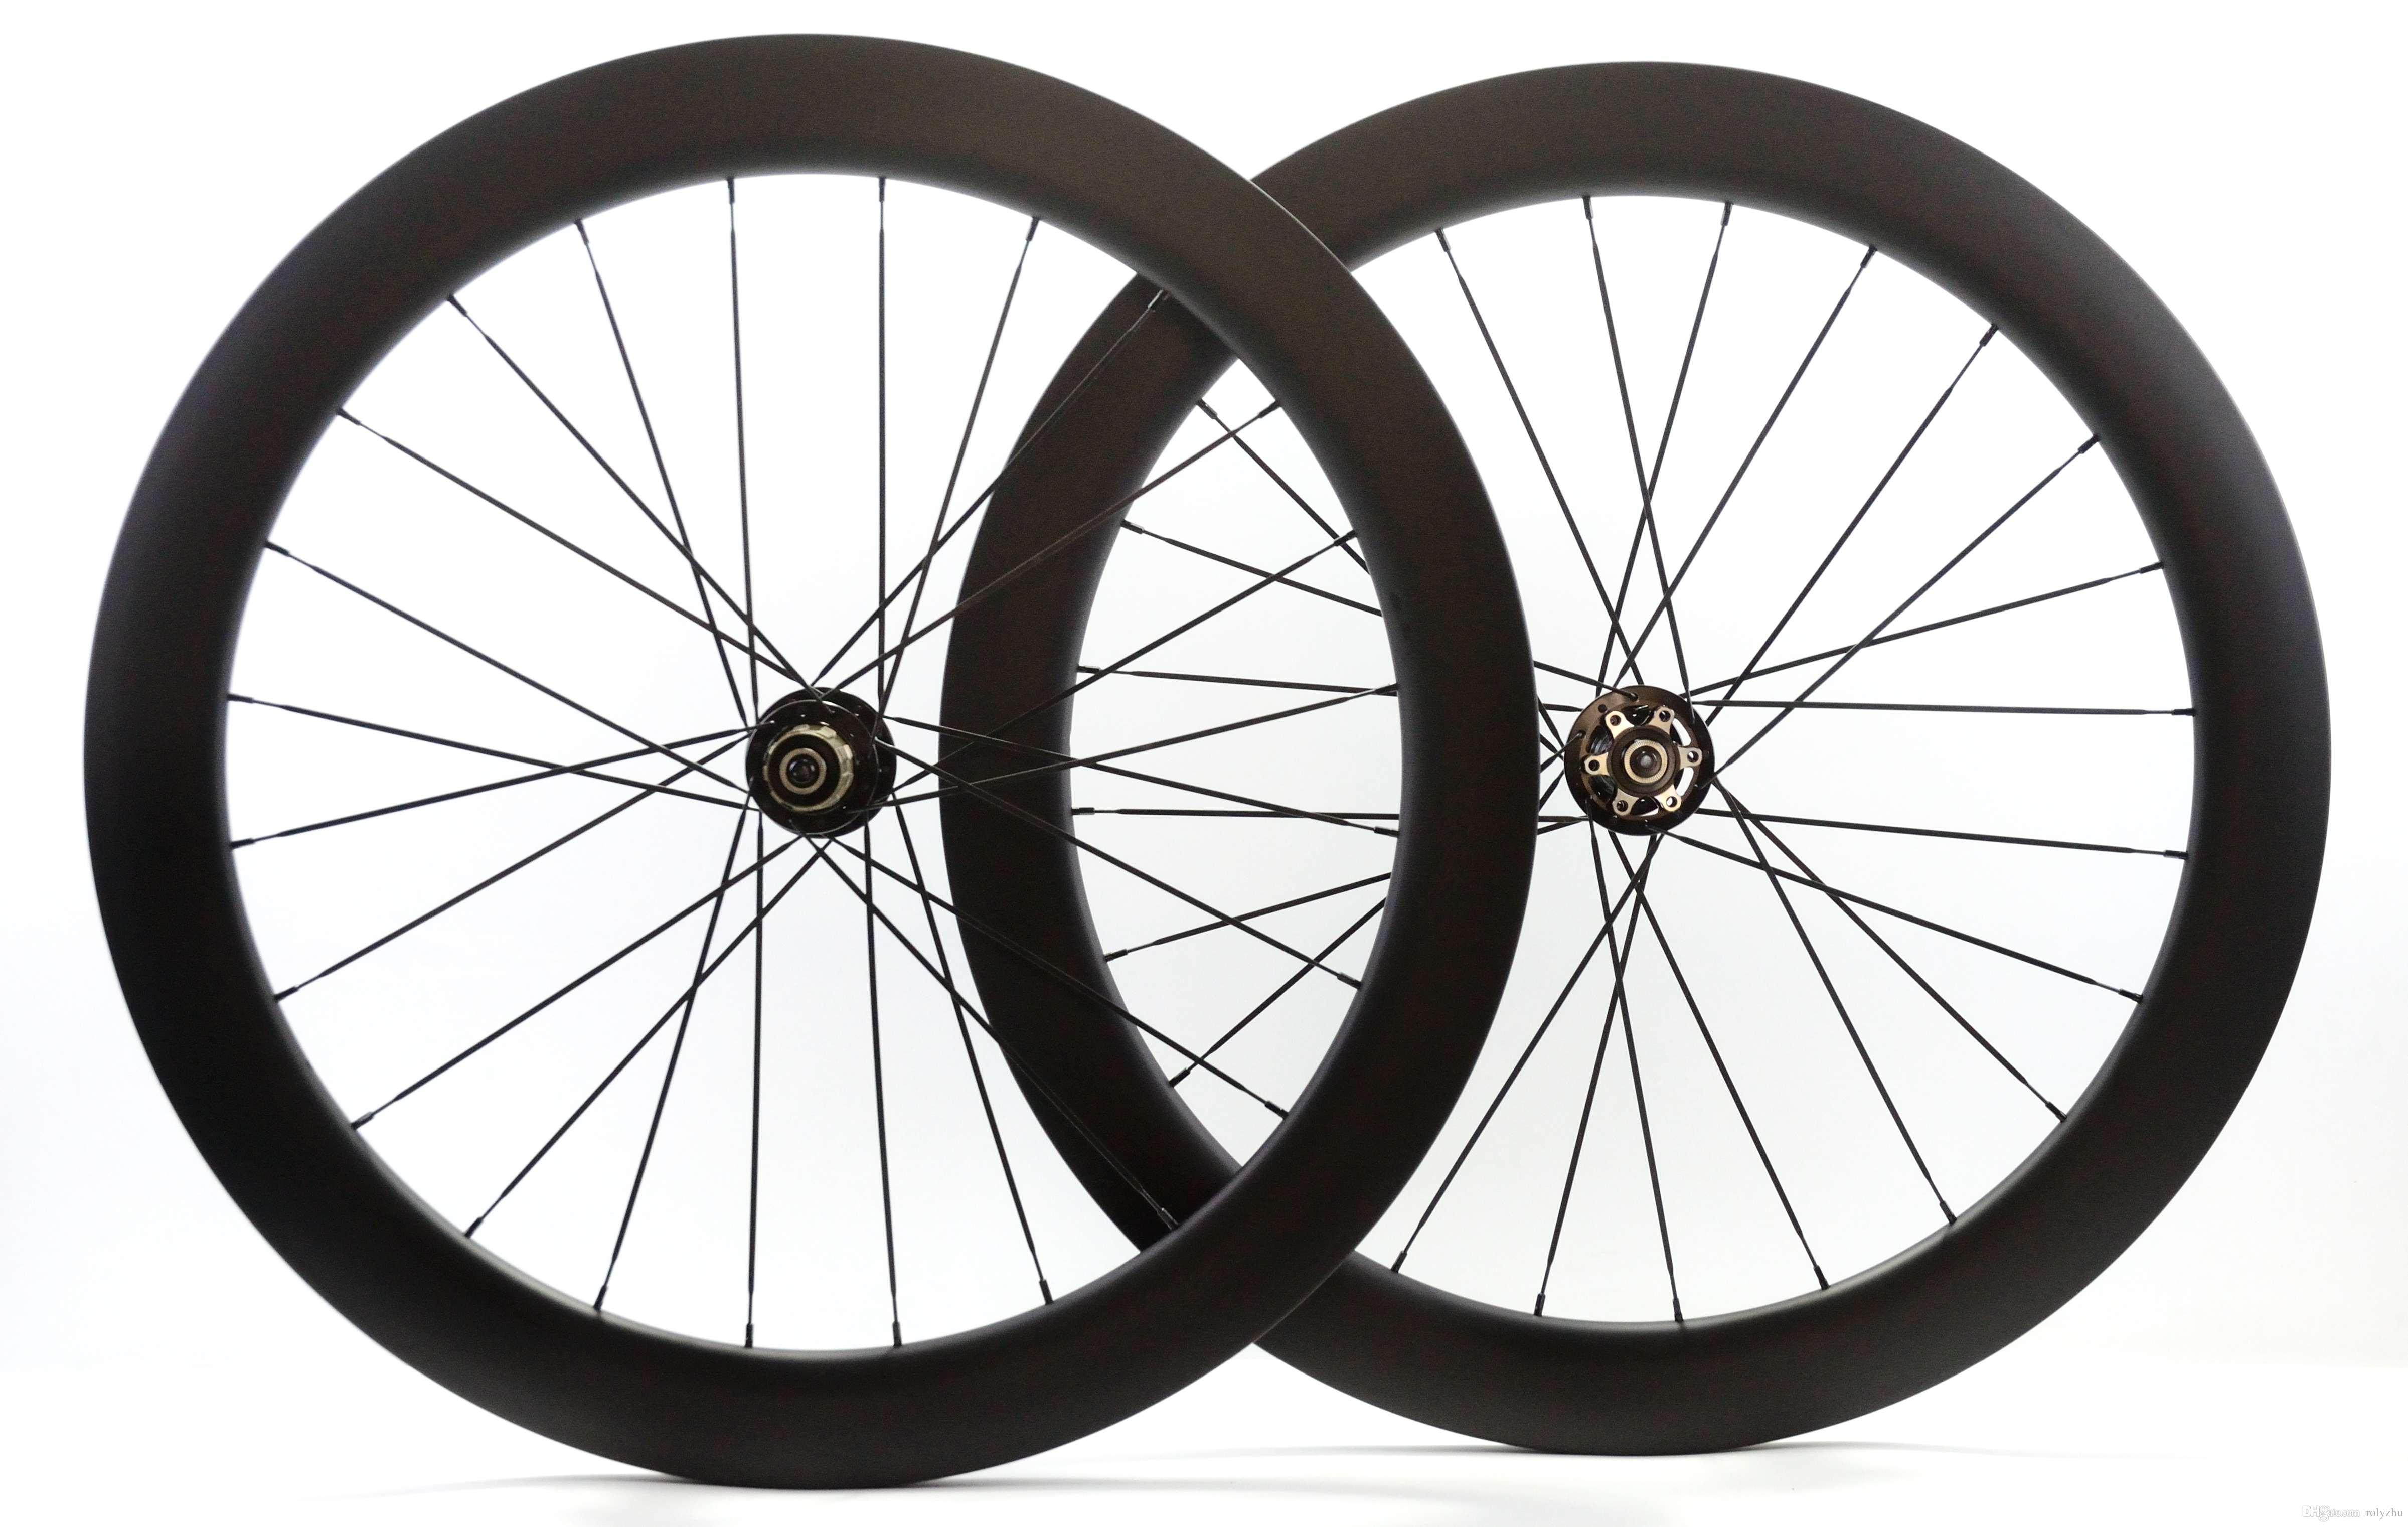 Carbon Fiber Wheels >> 700c Carbon Fiber Wheels 60mm Depth Disc Brake Wheelset 25mm Width